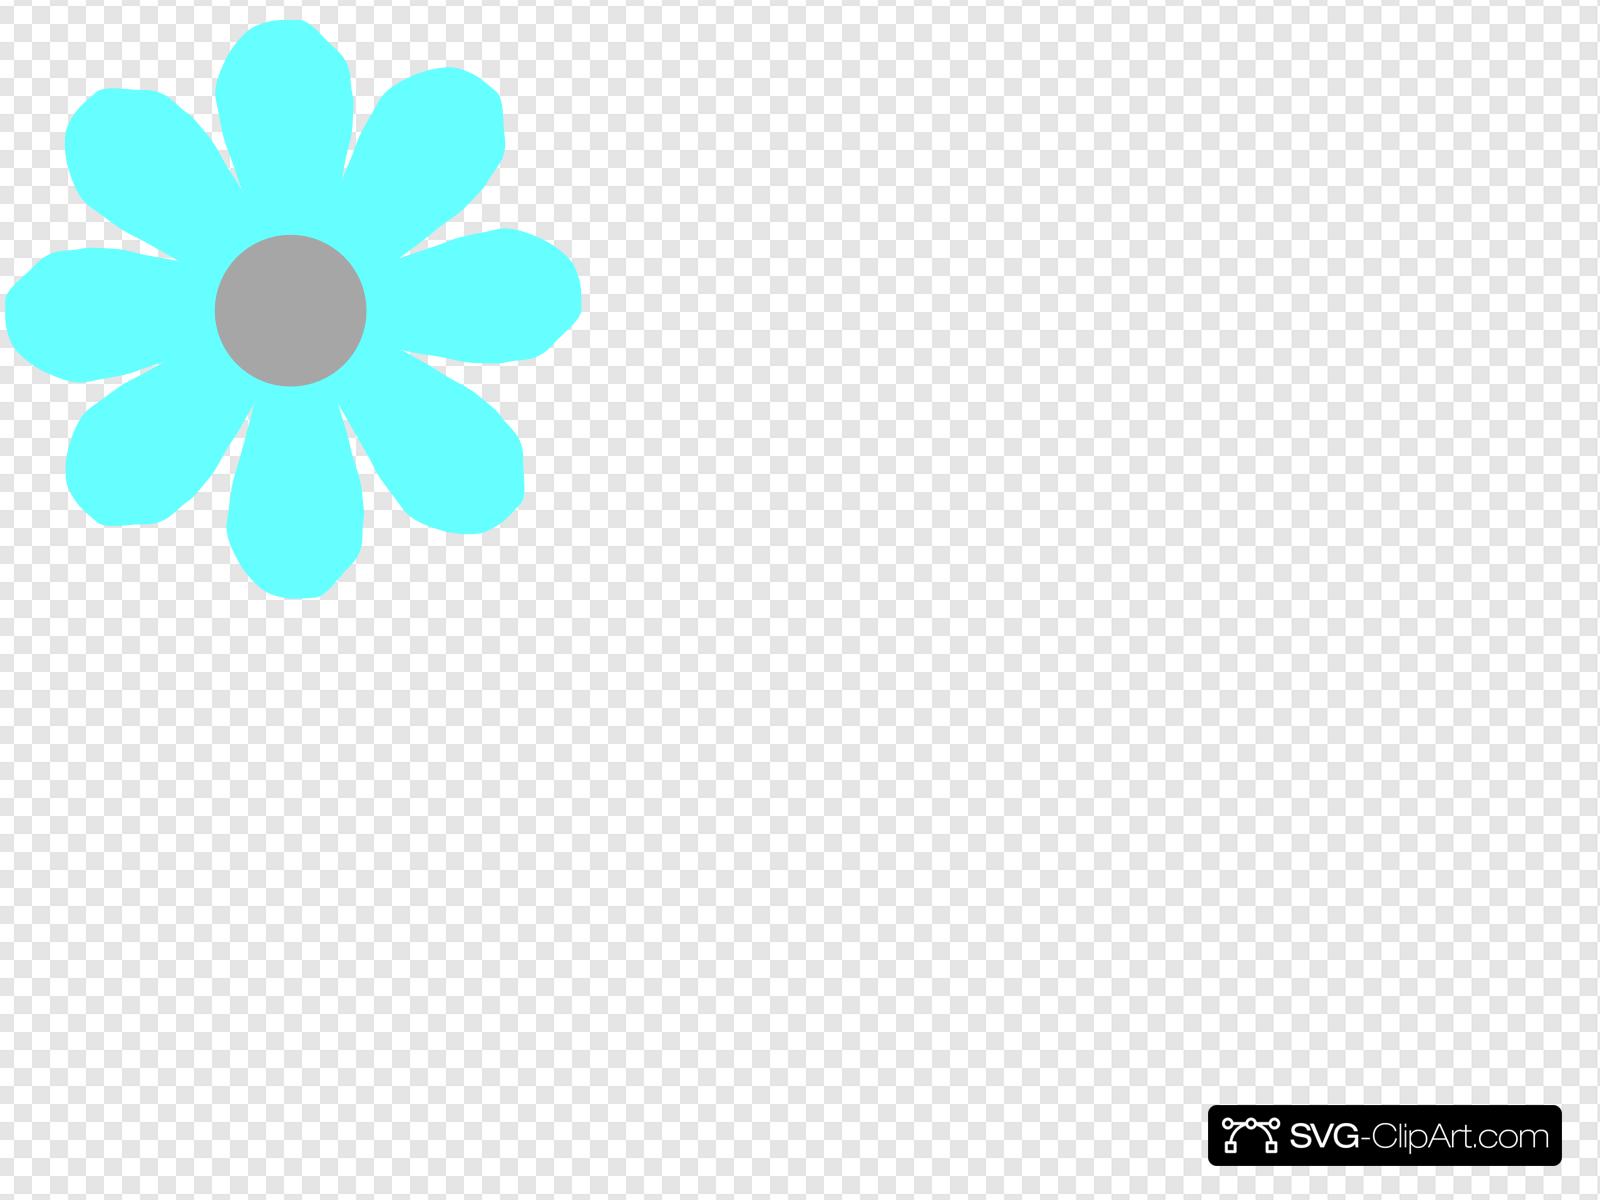 Aqua Flower Clip art, Icon and SVG.